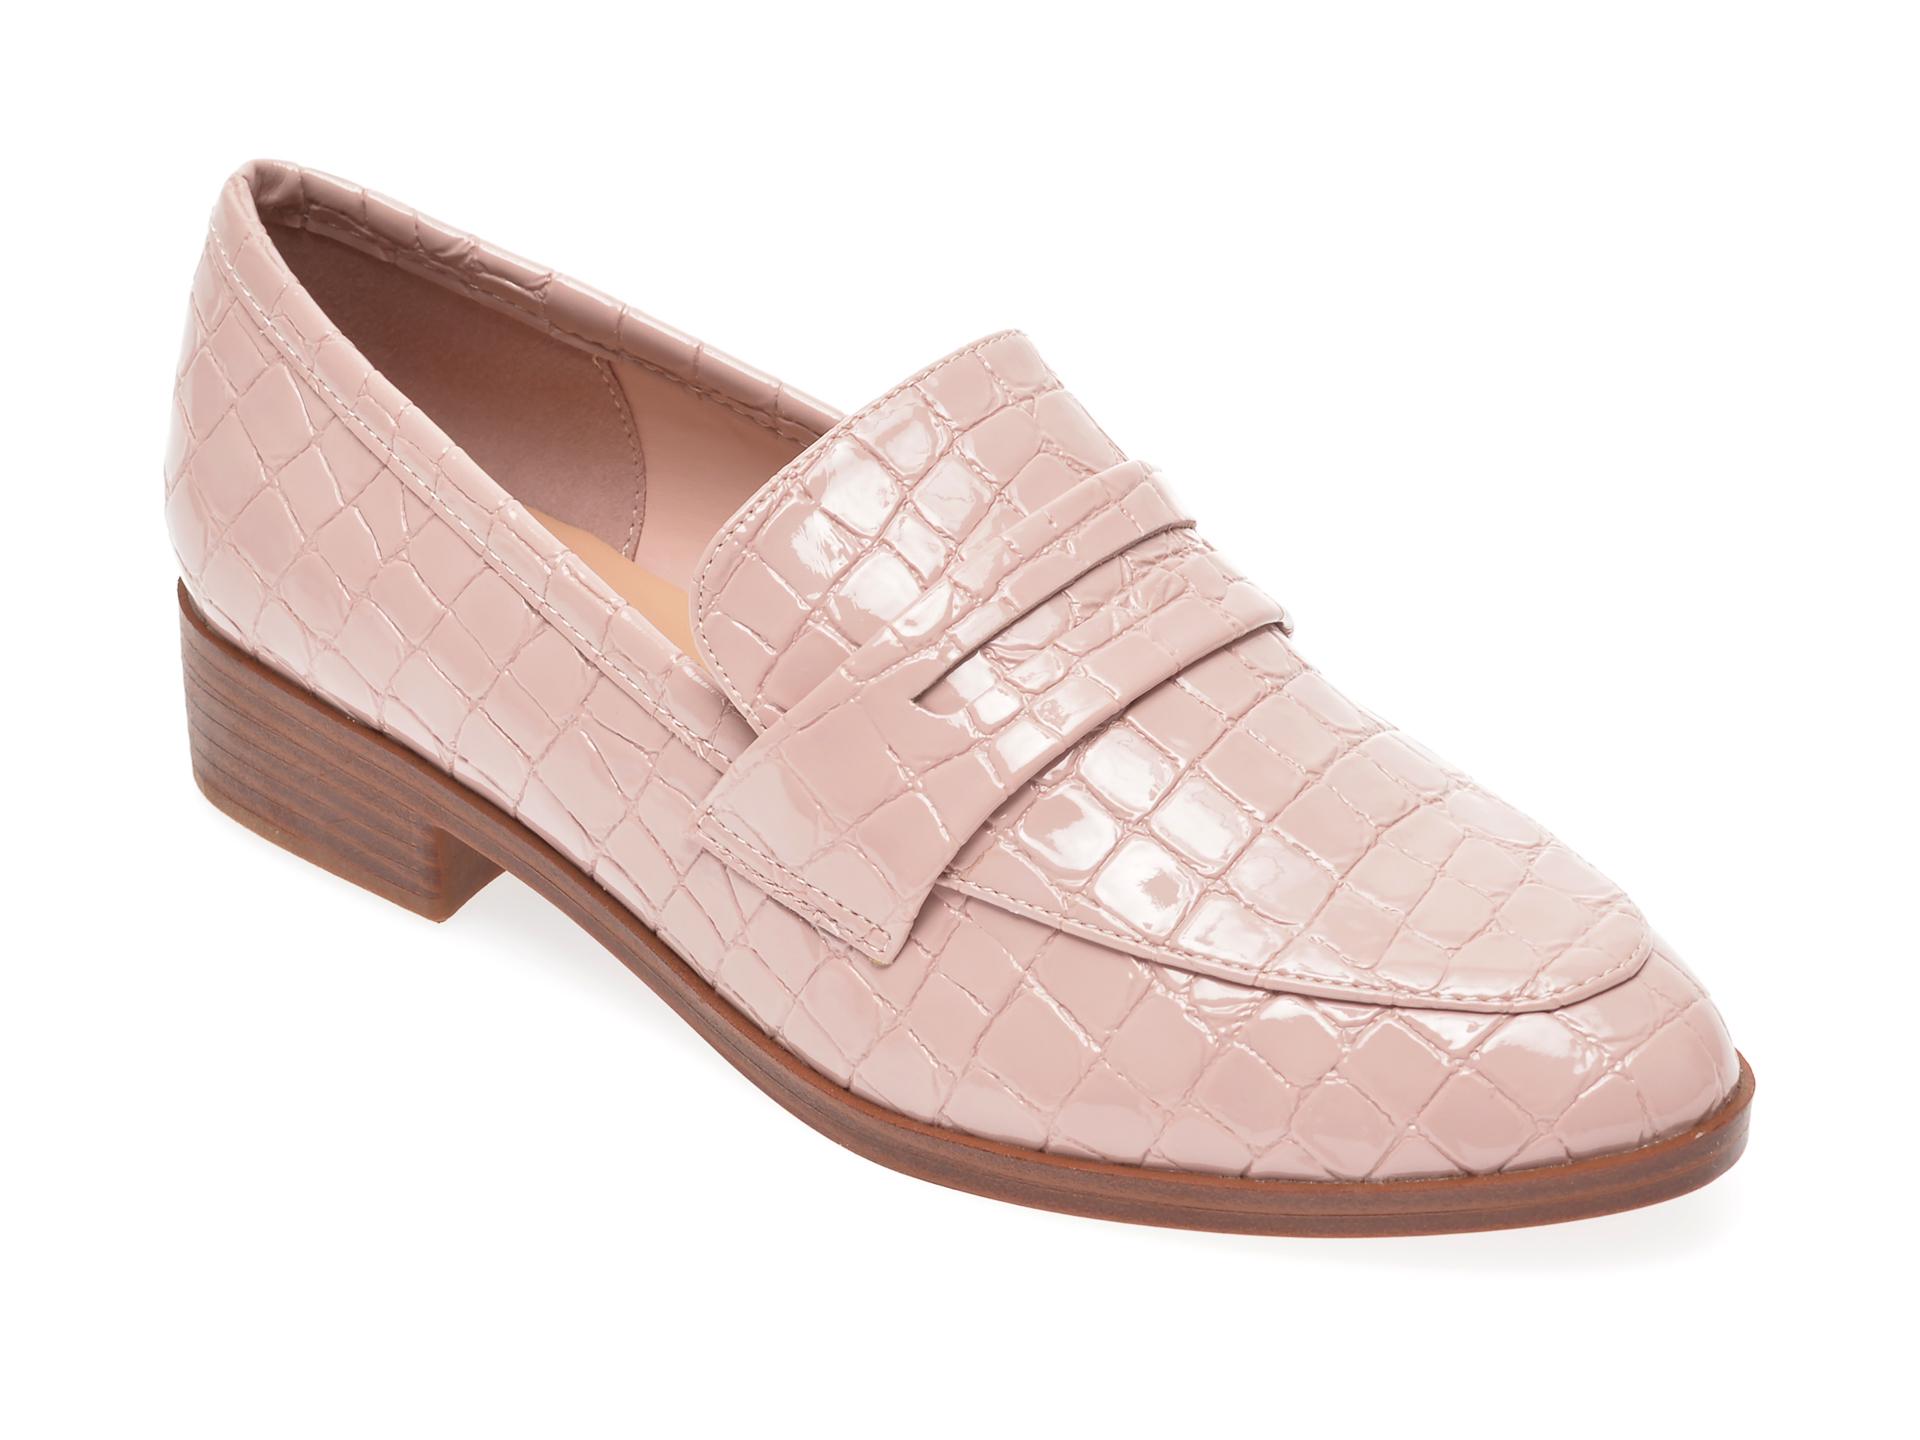 Pantofi ALDO roz, Langlet680, din piele ecologica imagine otter.ro 2021